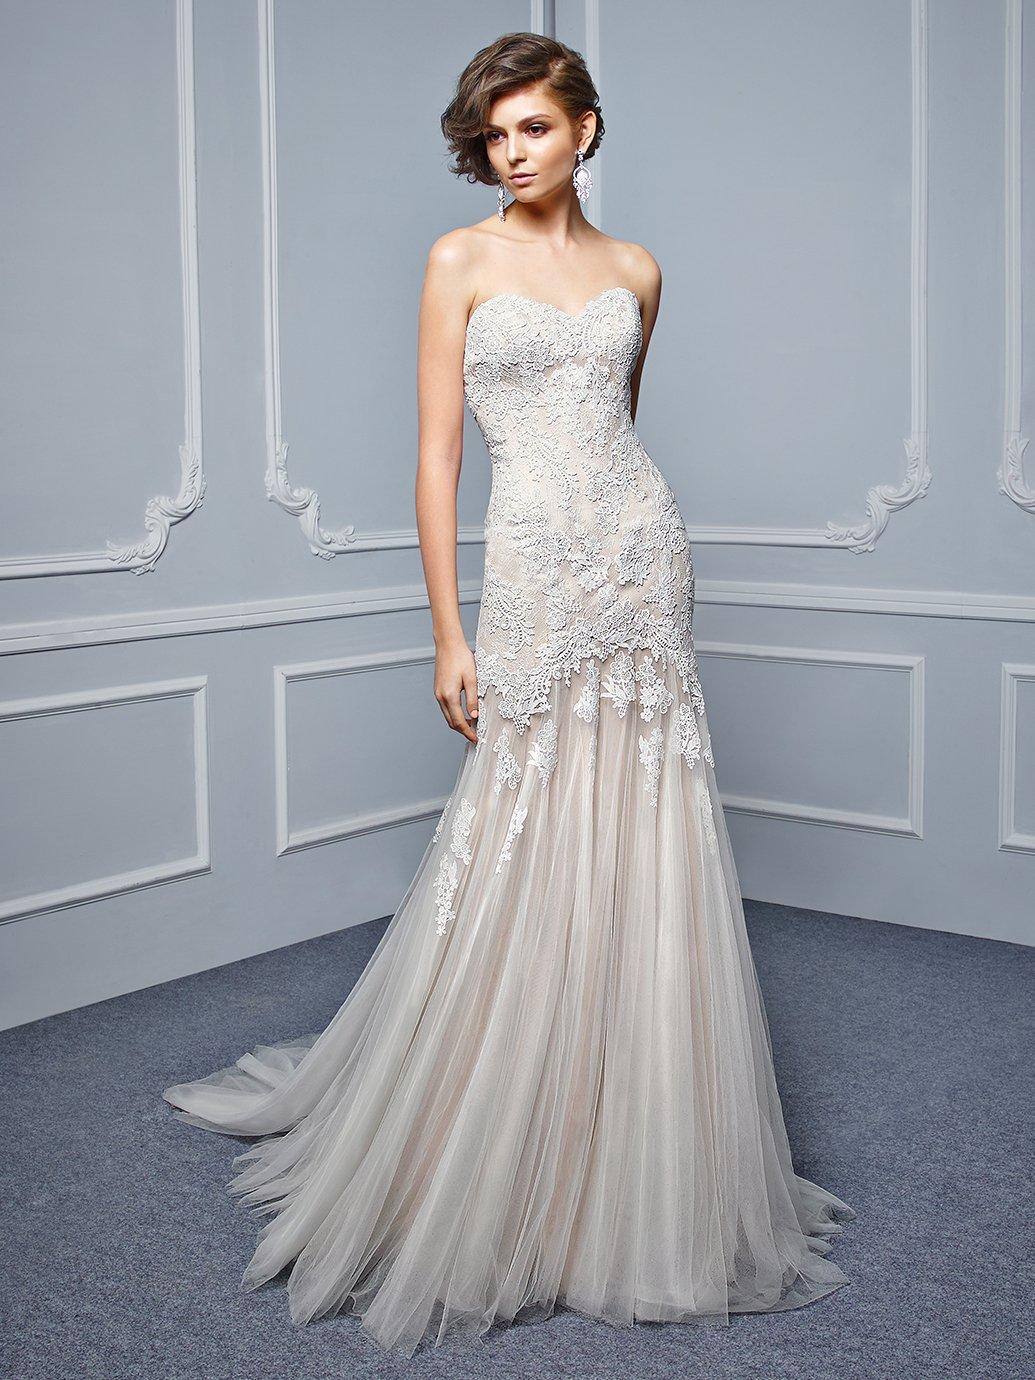 Contact us for designer wedding dresses in Kidderminster